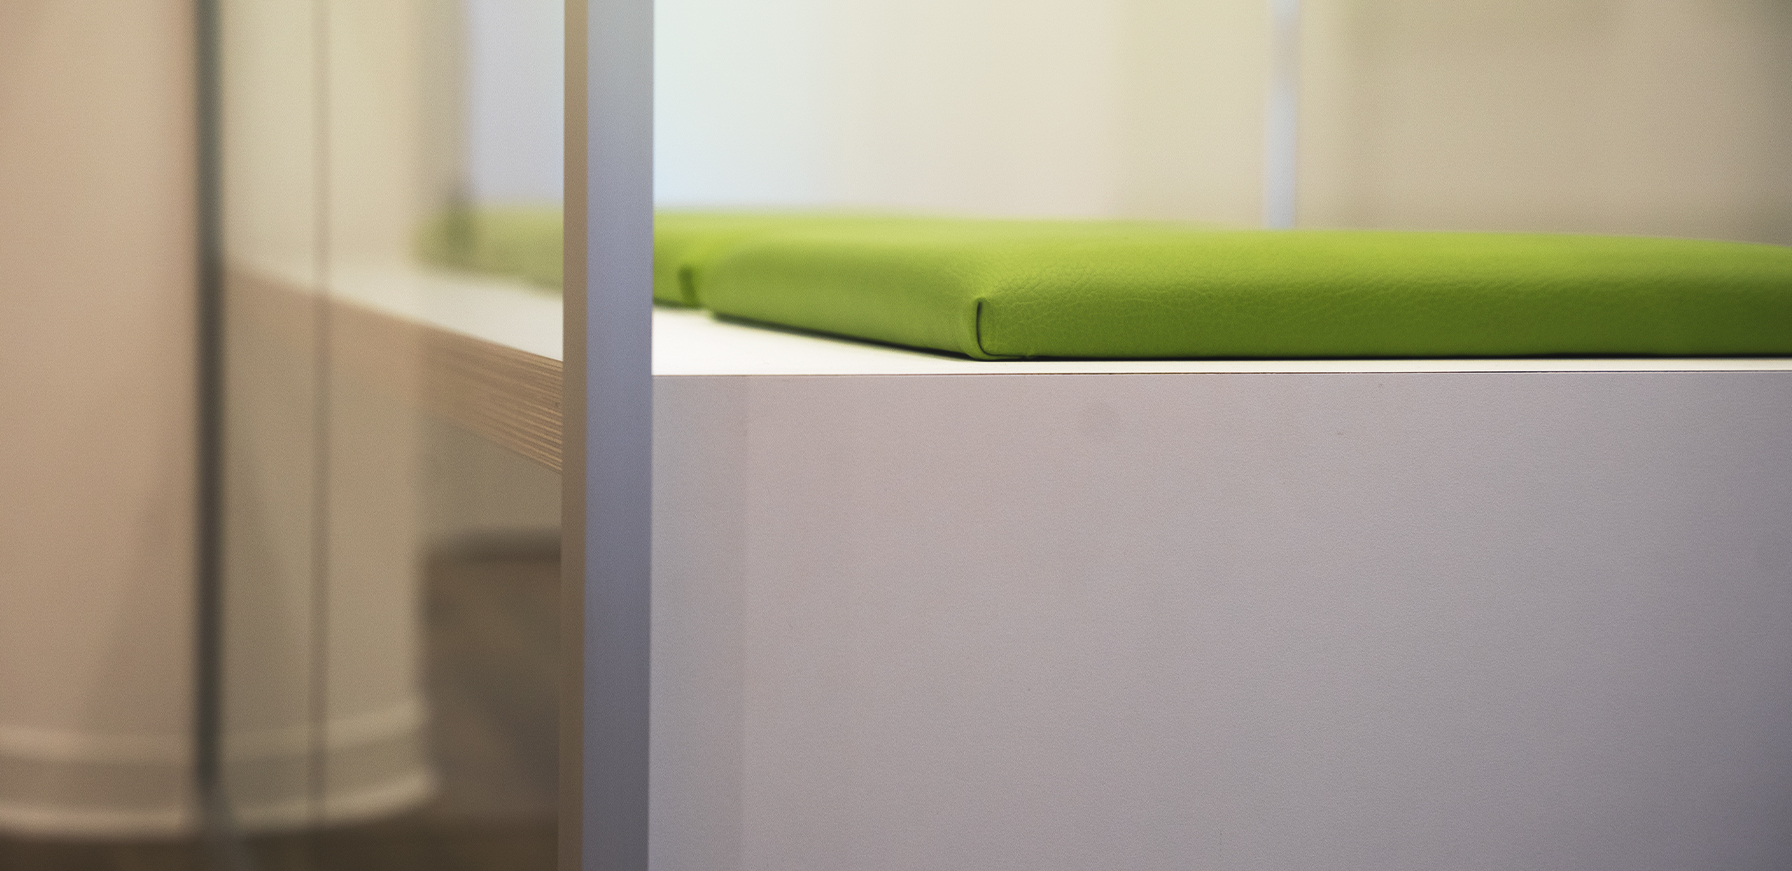 Praxis-fuer-Physiotherapie-Muhl-und-Pallokat-GbR – Seelhorster Garten Anmeldung